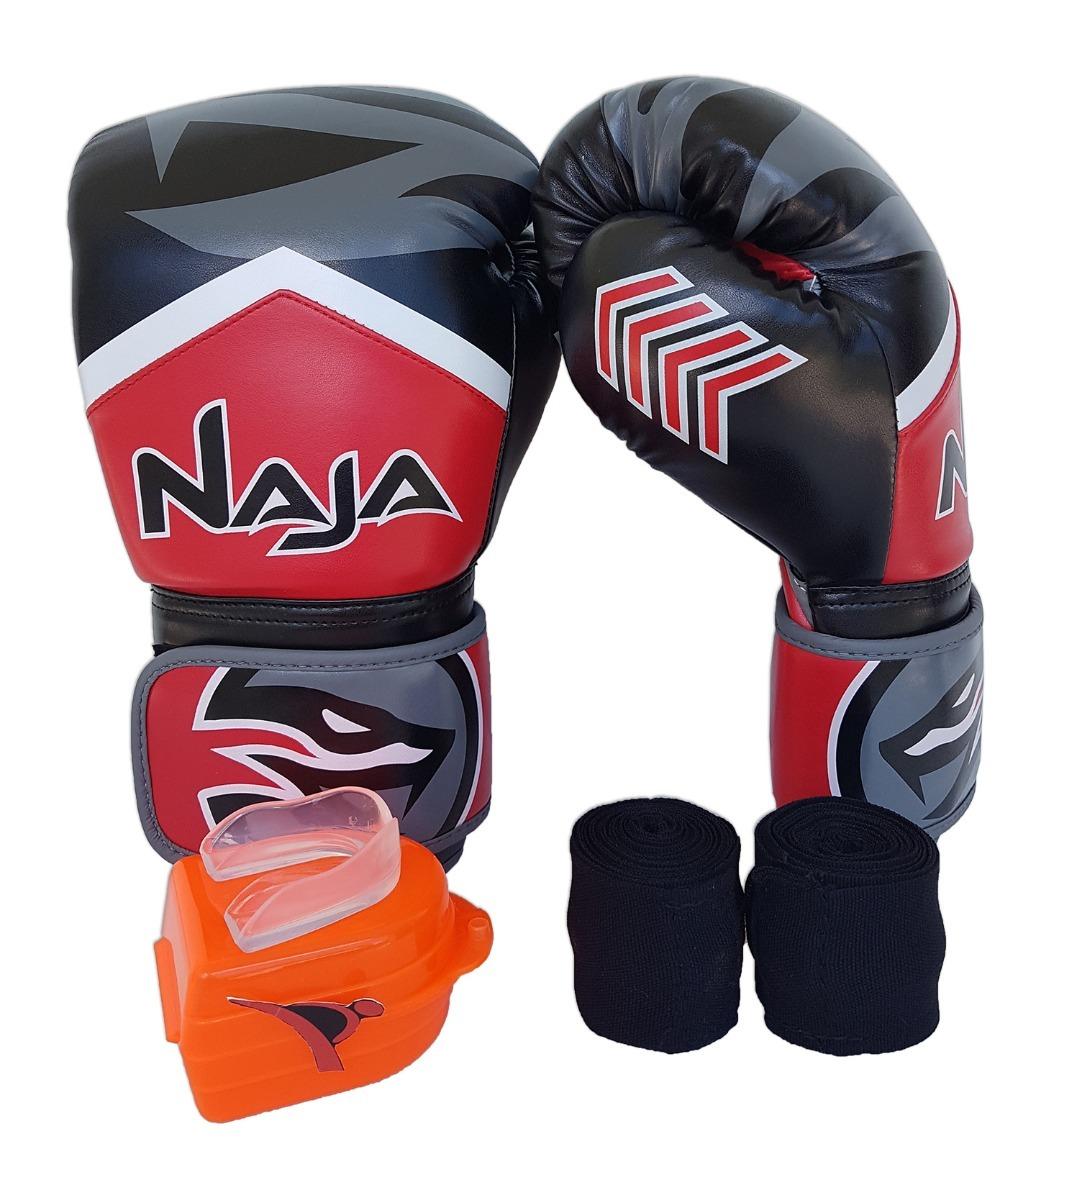 aac917f25 kit de boxe muay thai luva band bucal vermelho extreme naja. Carregando  zoom.